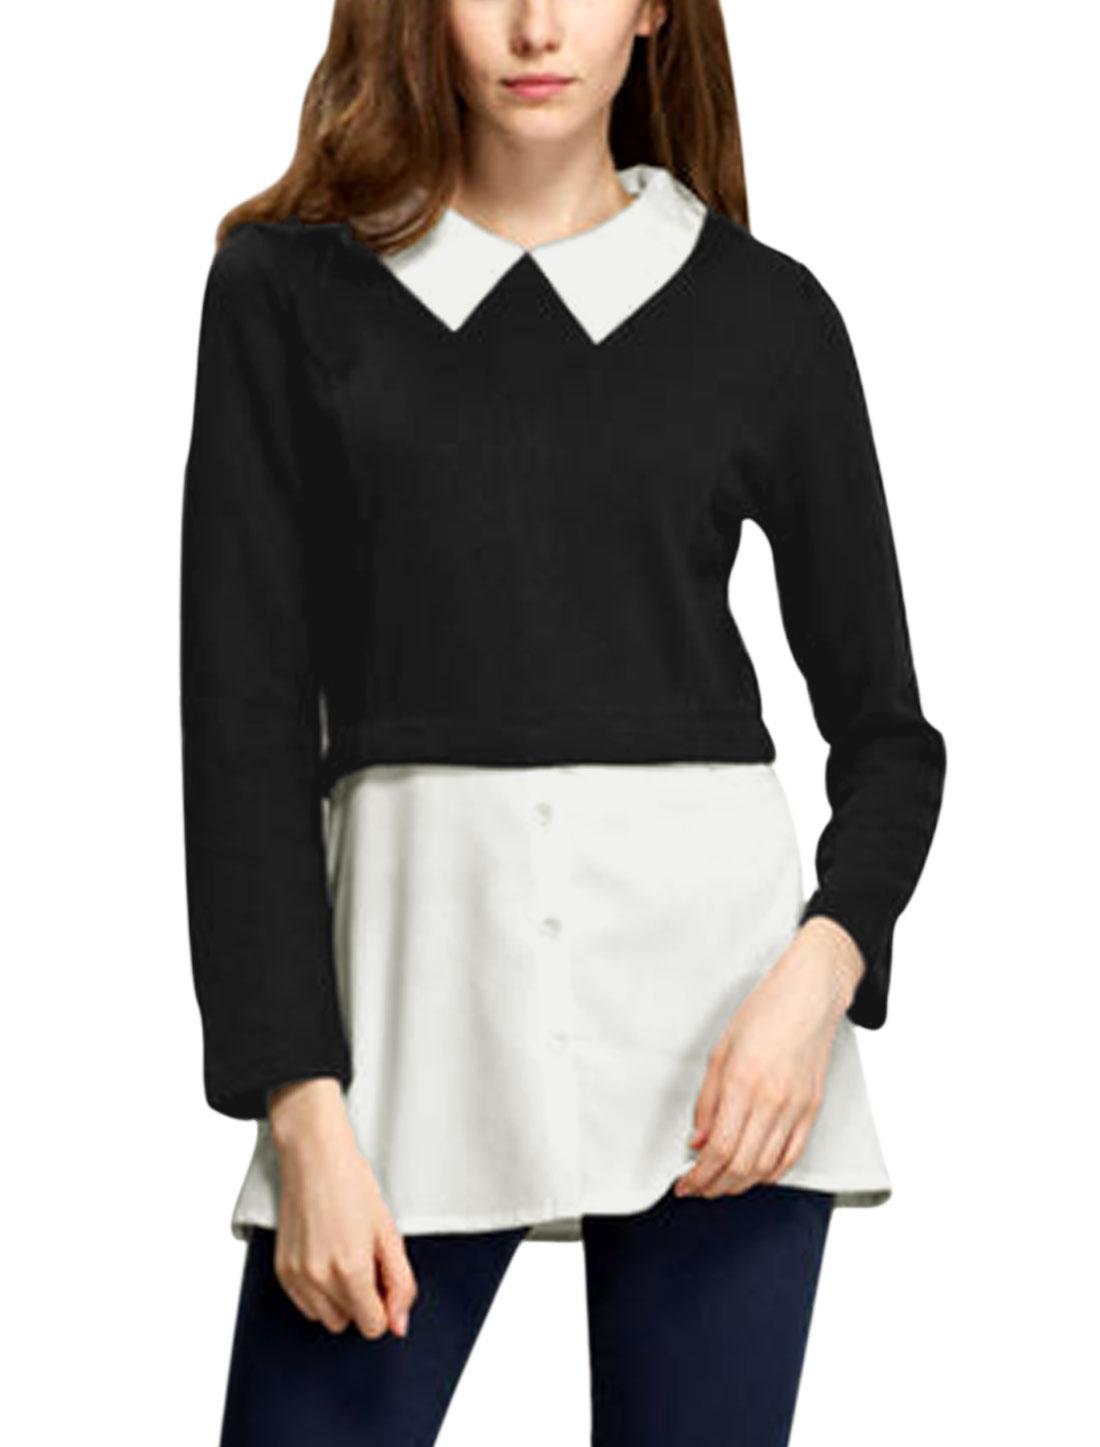 Ladies White Black Layered Shirts Splice Half Button Down Tunic Shirt XS